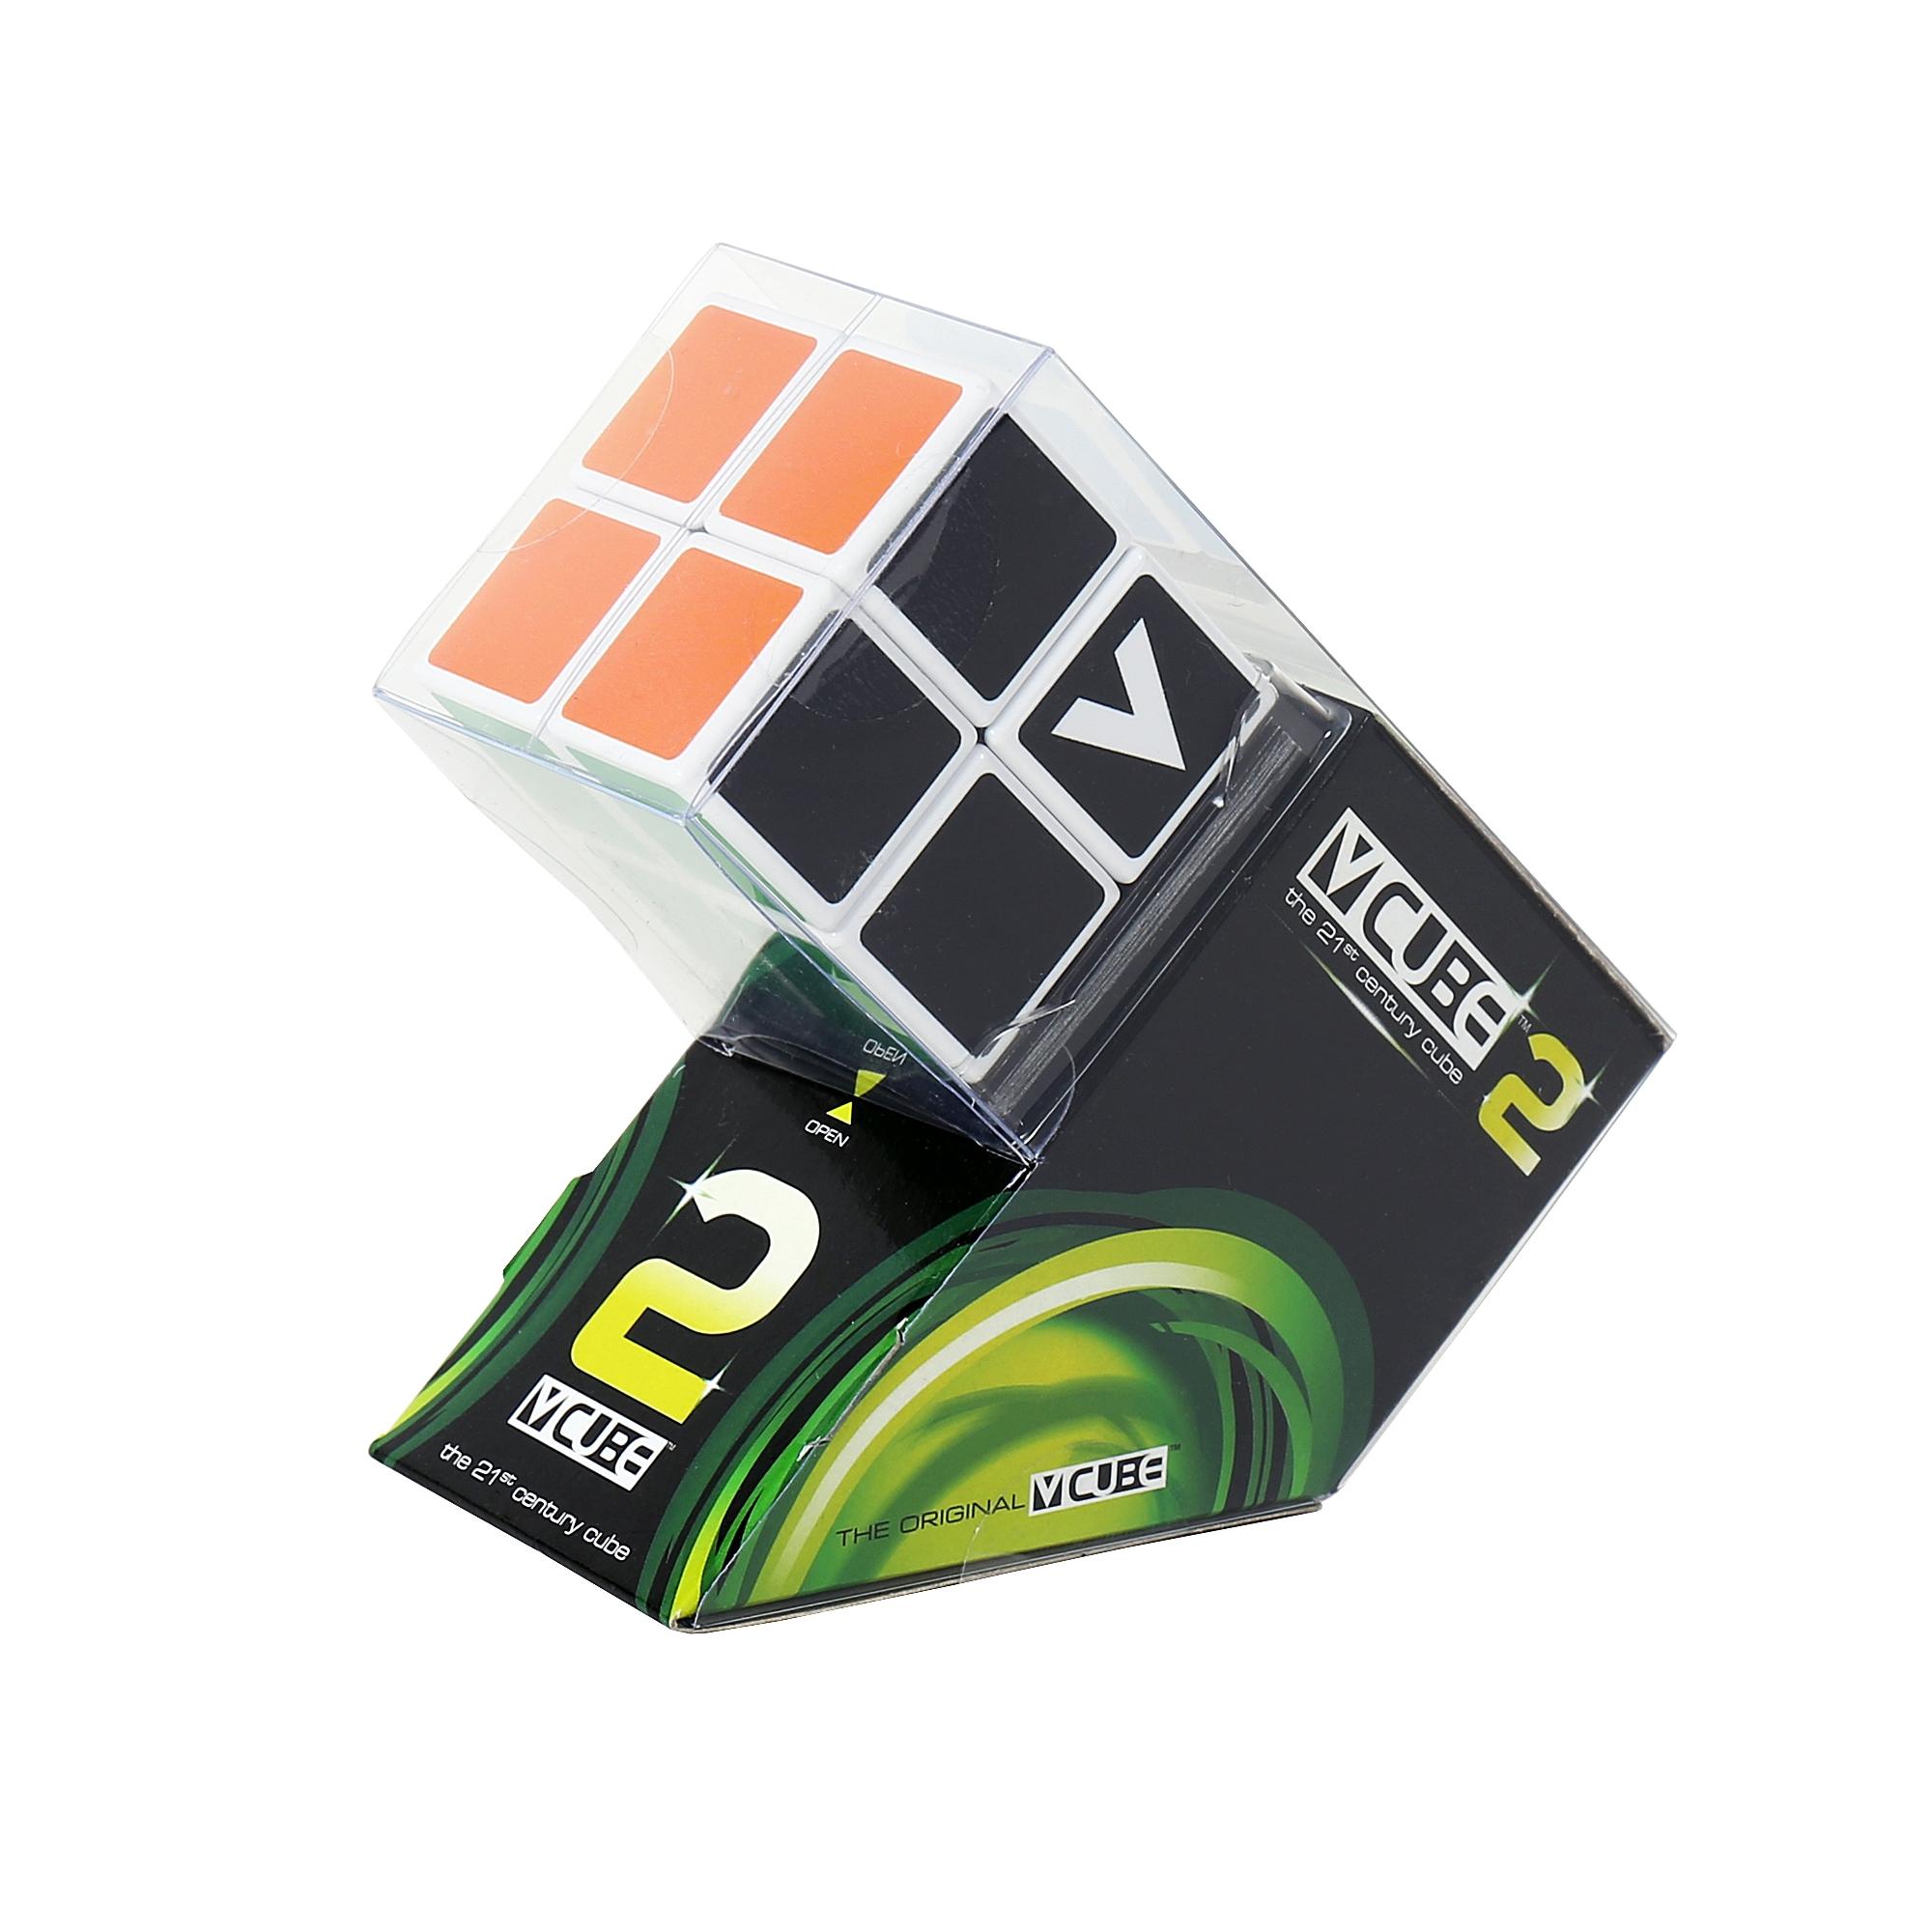 V-cube 2 Flat